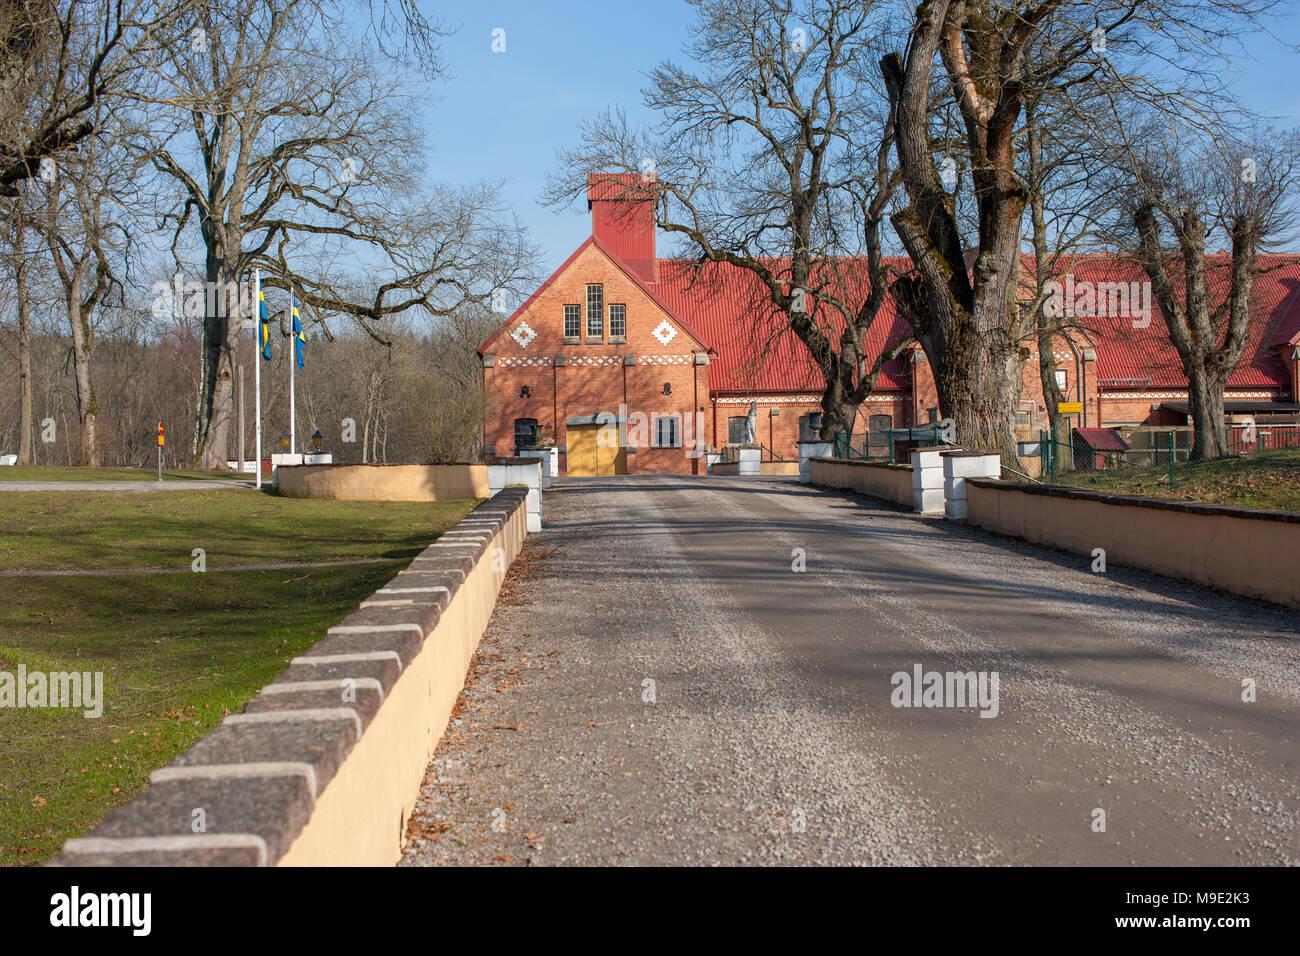 Nykvarns Kommun Stock Photos and Images - Alamy